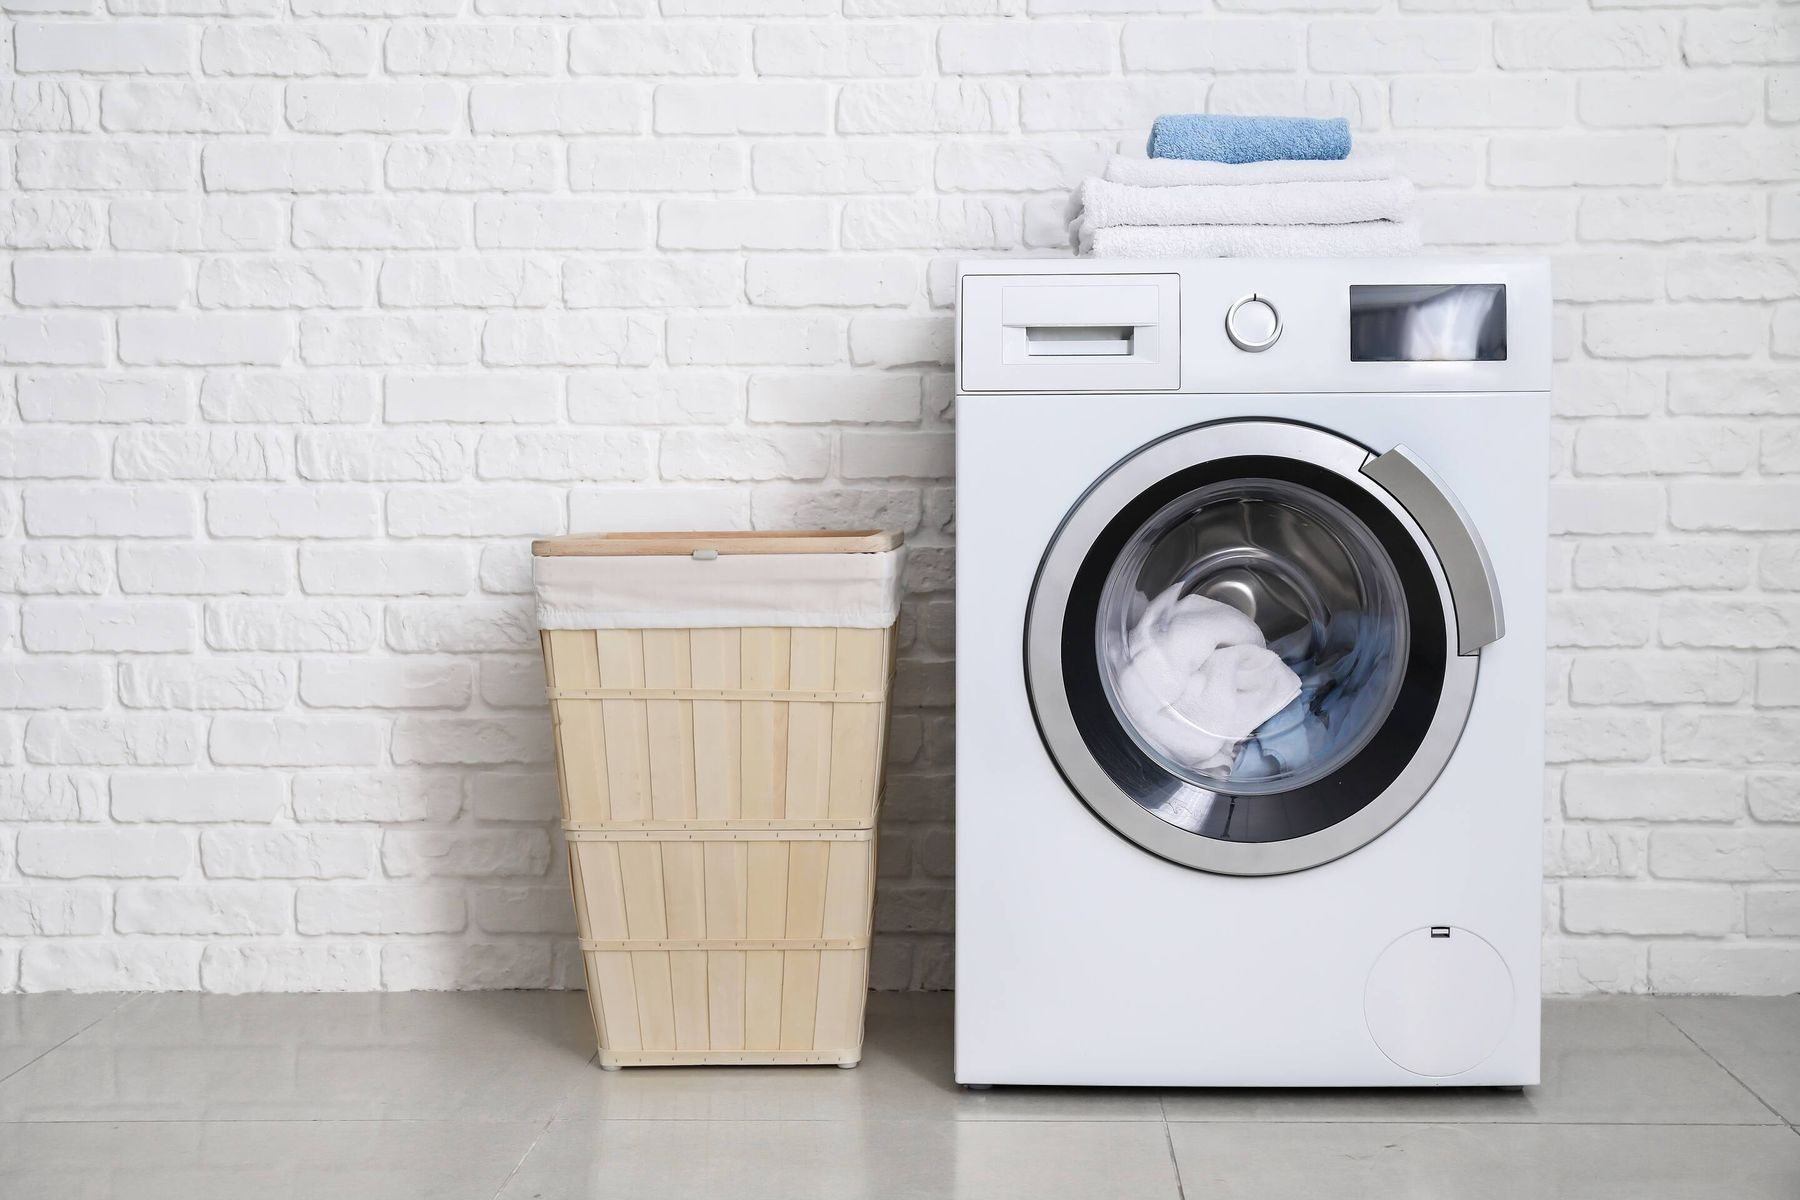 Kinh doanh online đồ gia dụng máy giặt